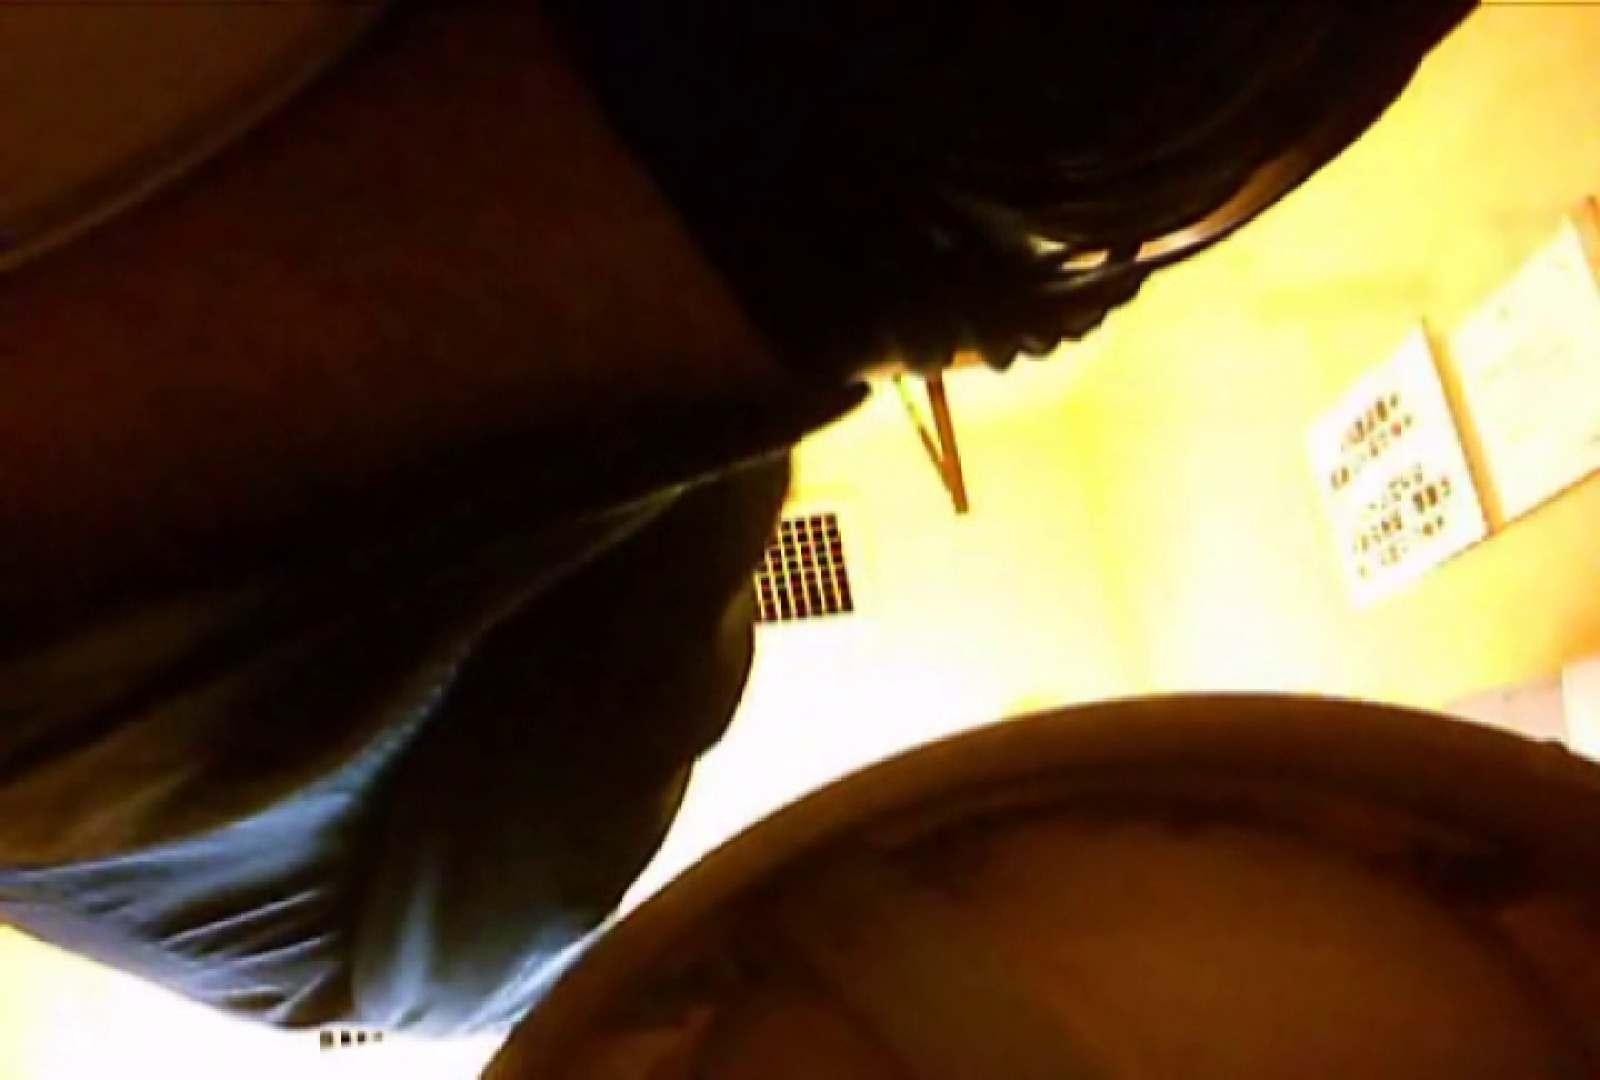 SEASON 2ND!掴み取りさんの洗面所覗き!in新幹線!VOL.02 覗きお宝 ゲイSEX画像 80連発 16